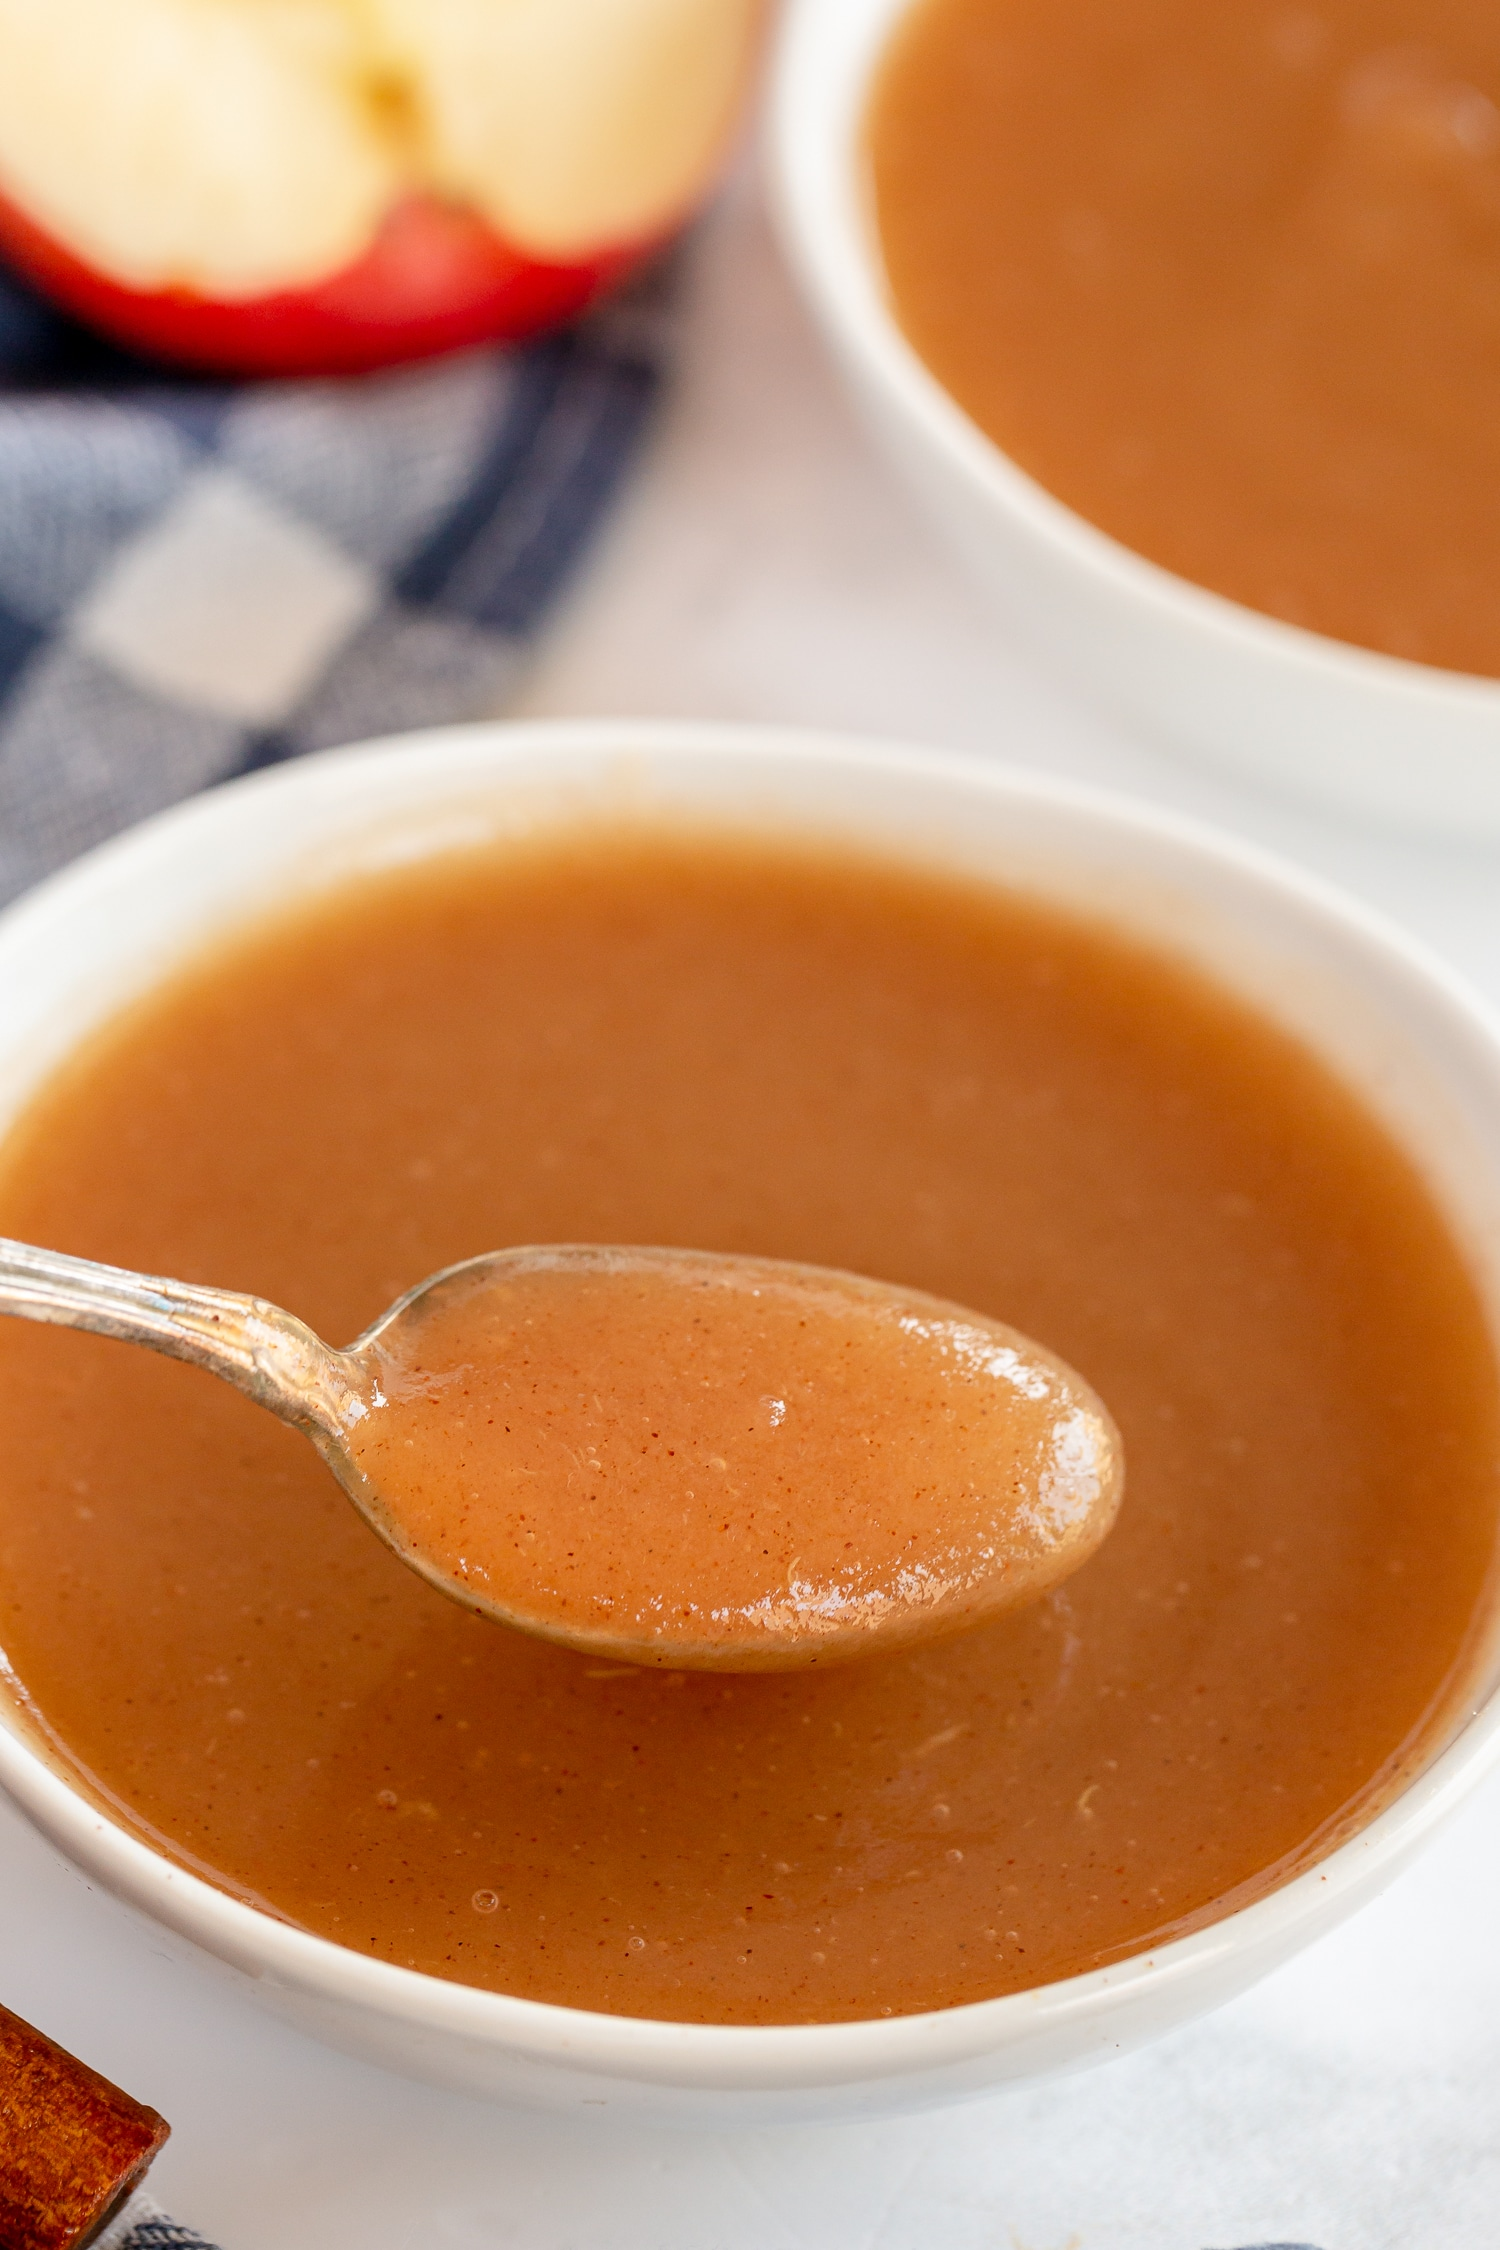 spoonful of brown sugar applesauce